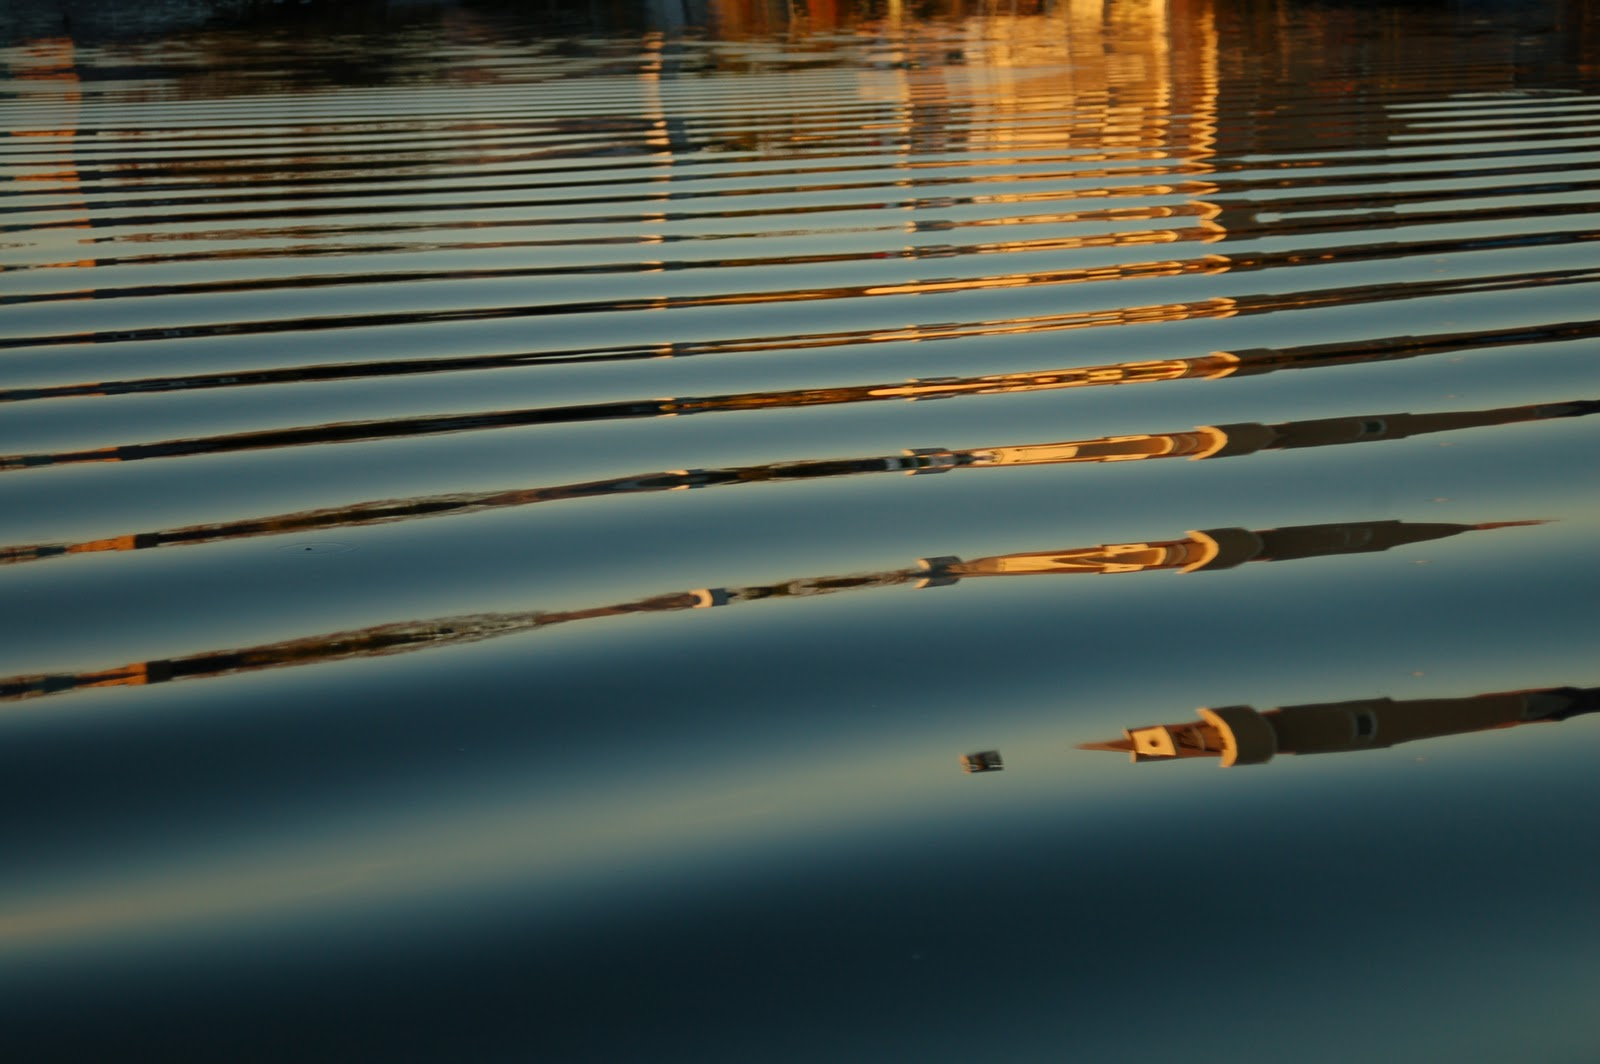 Horizontal Lines Photography